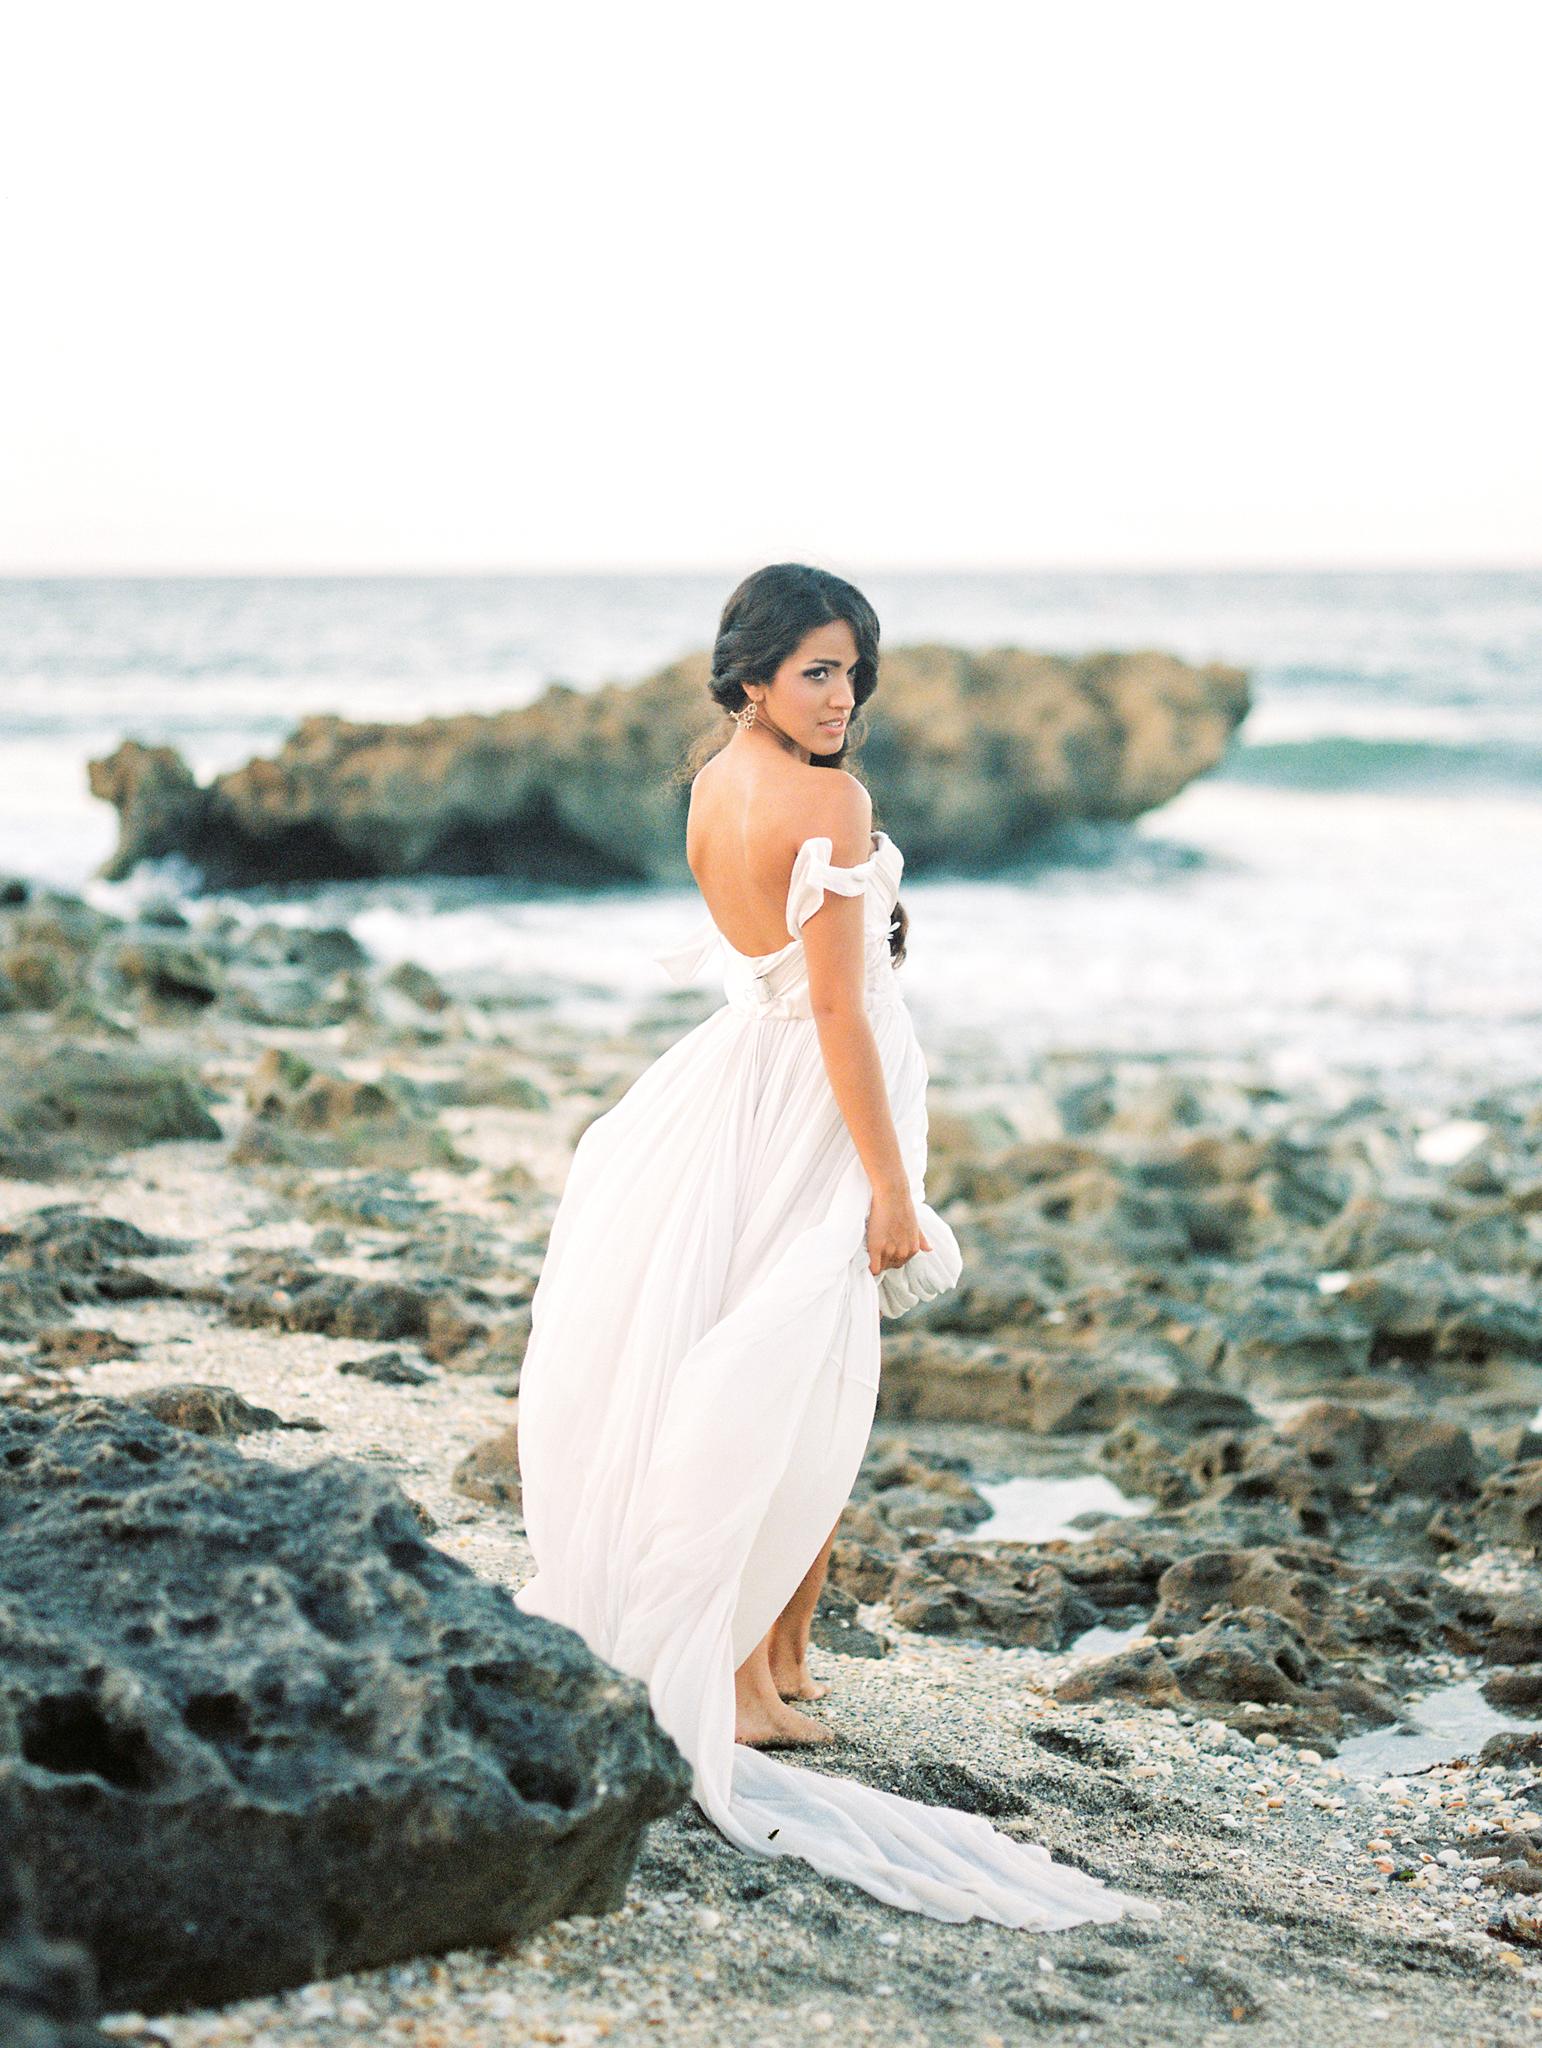 coral cove, jupiter beach FL, palm beach wedding photos, bride with flowing dress on beach